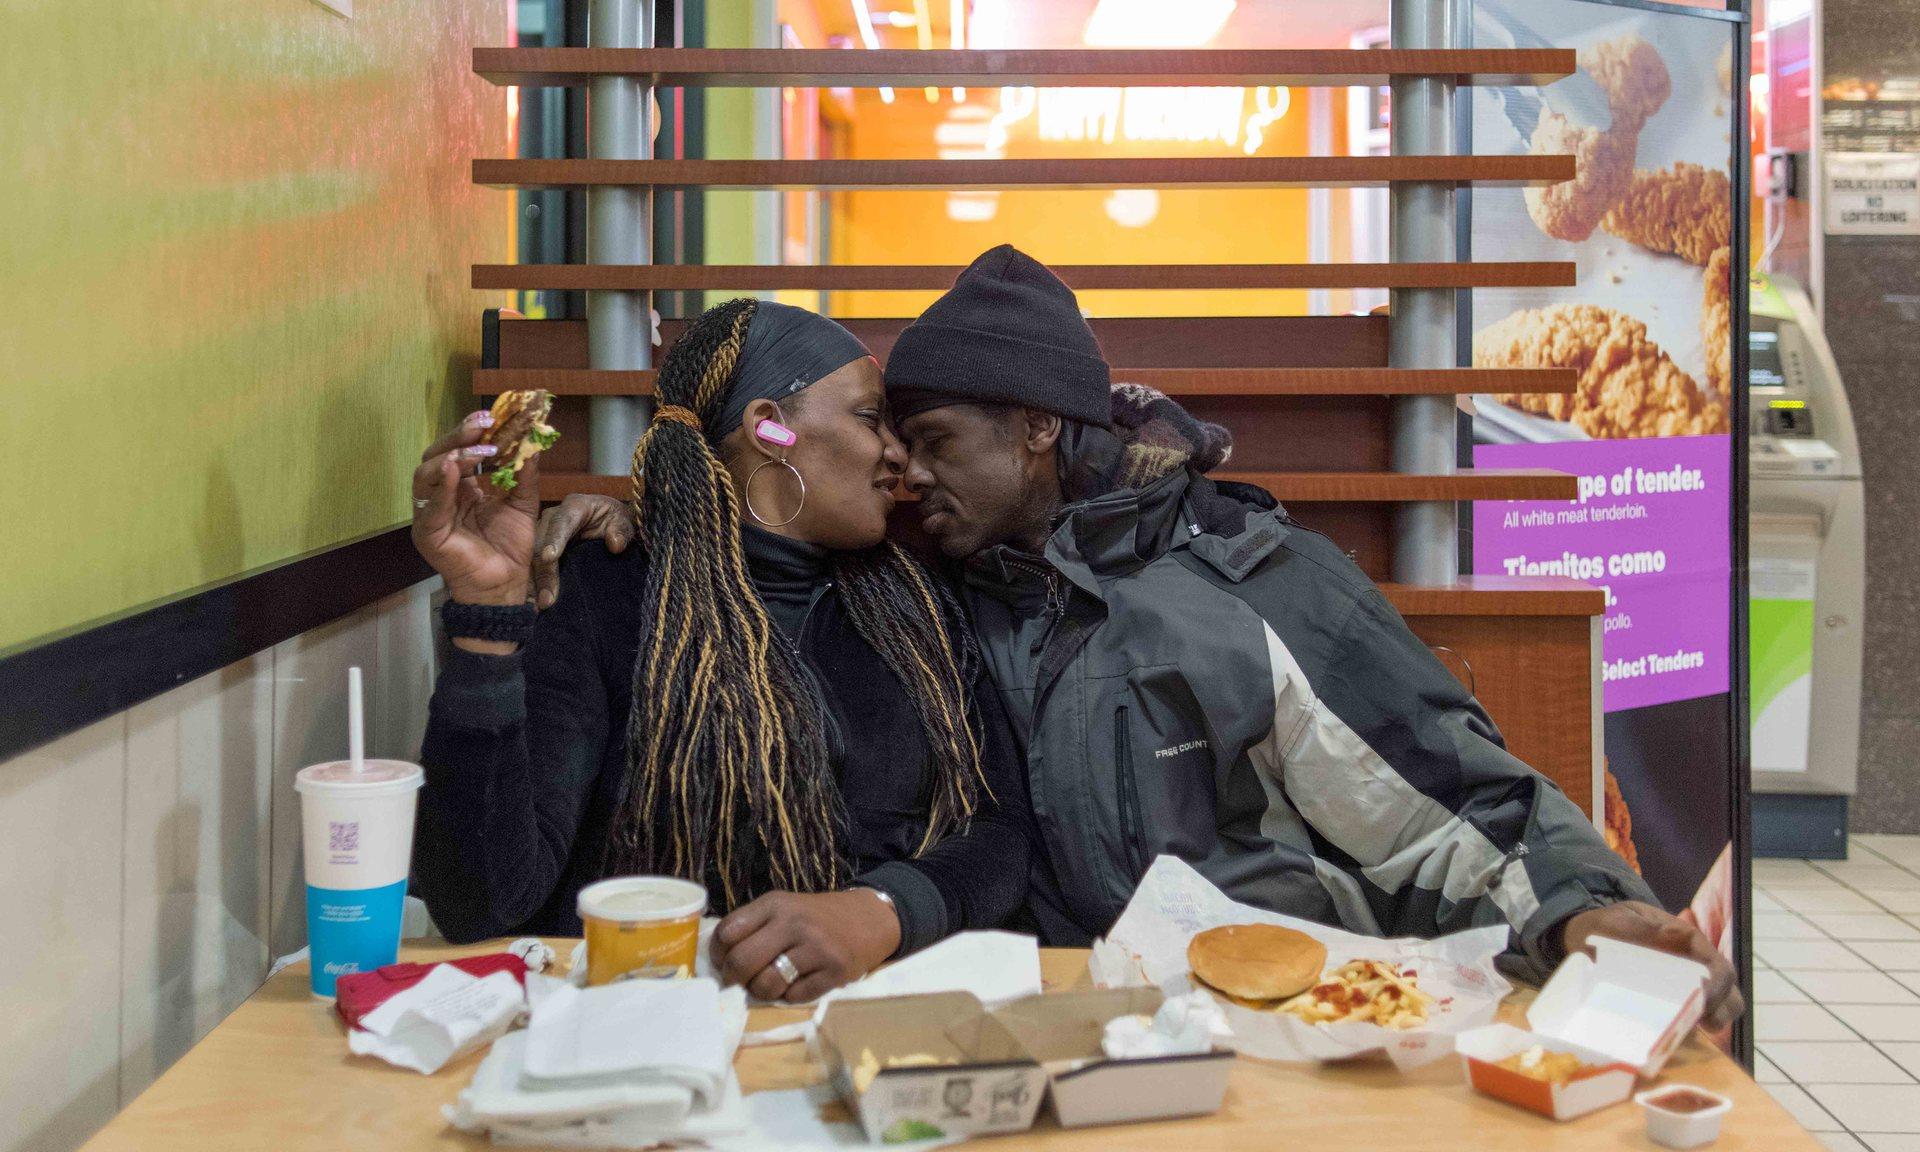 Takeesha and Steve, Bronx, New York. Photograph: Chris Arnade for the Guardian